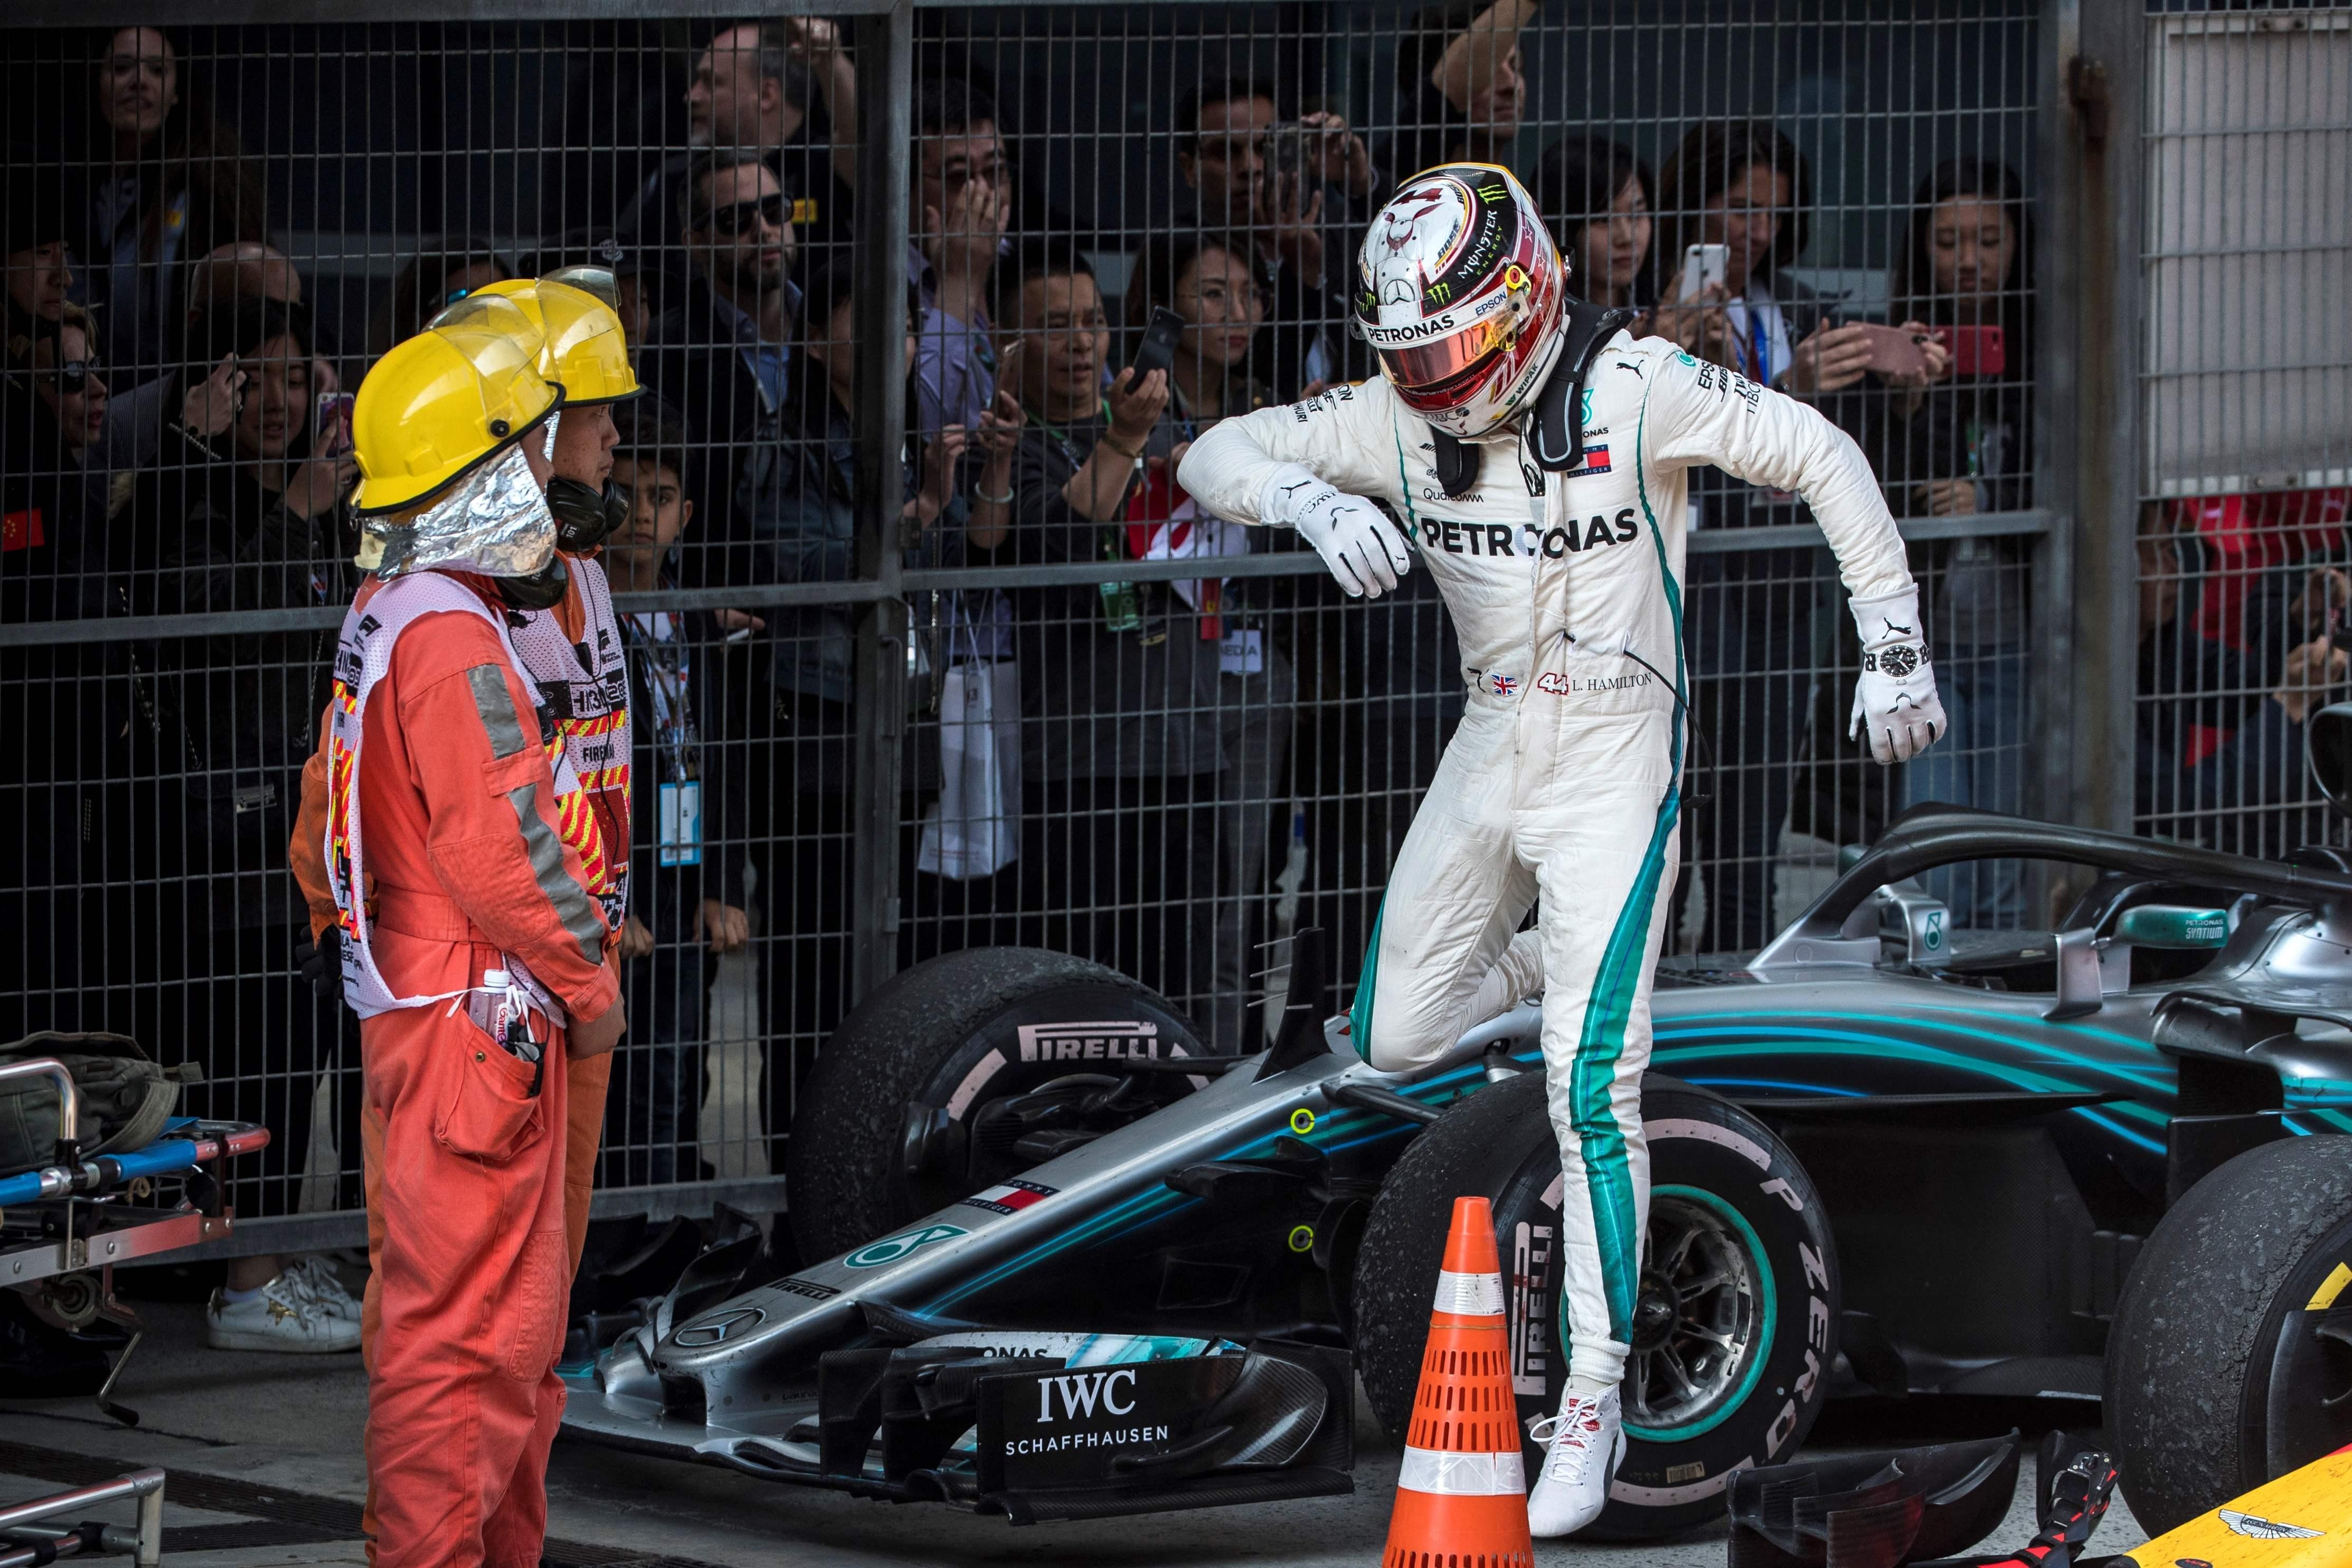 Lewis Hamilton has now endured back-to-back F1 shockers